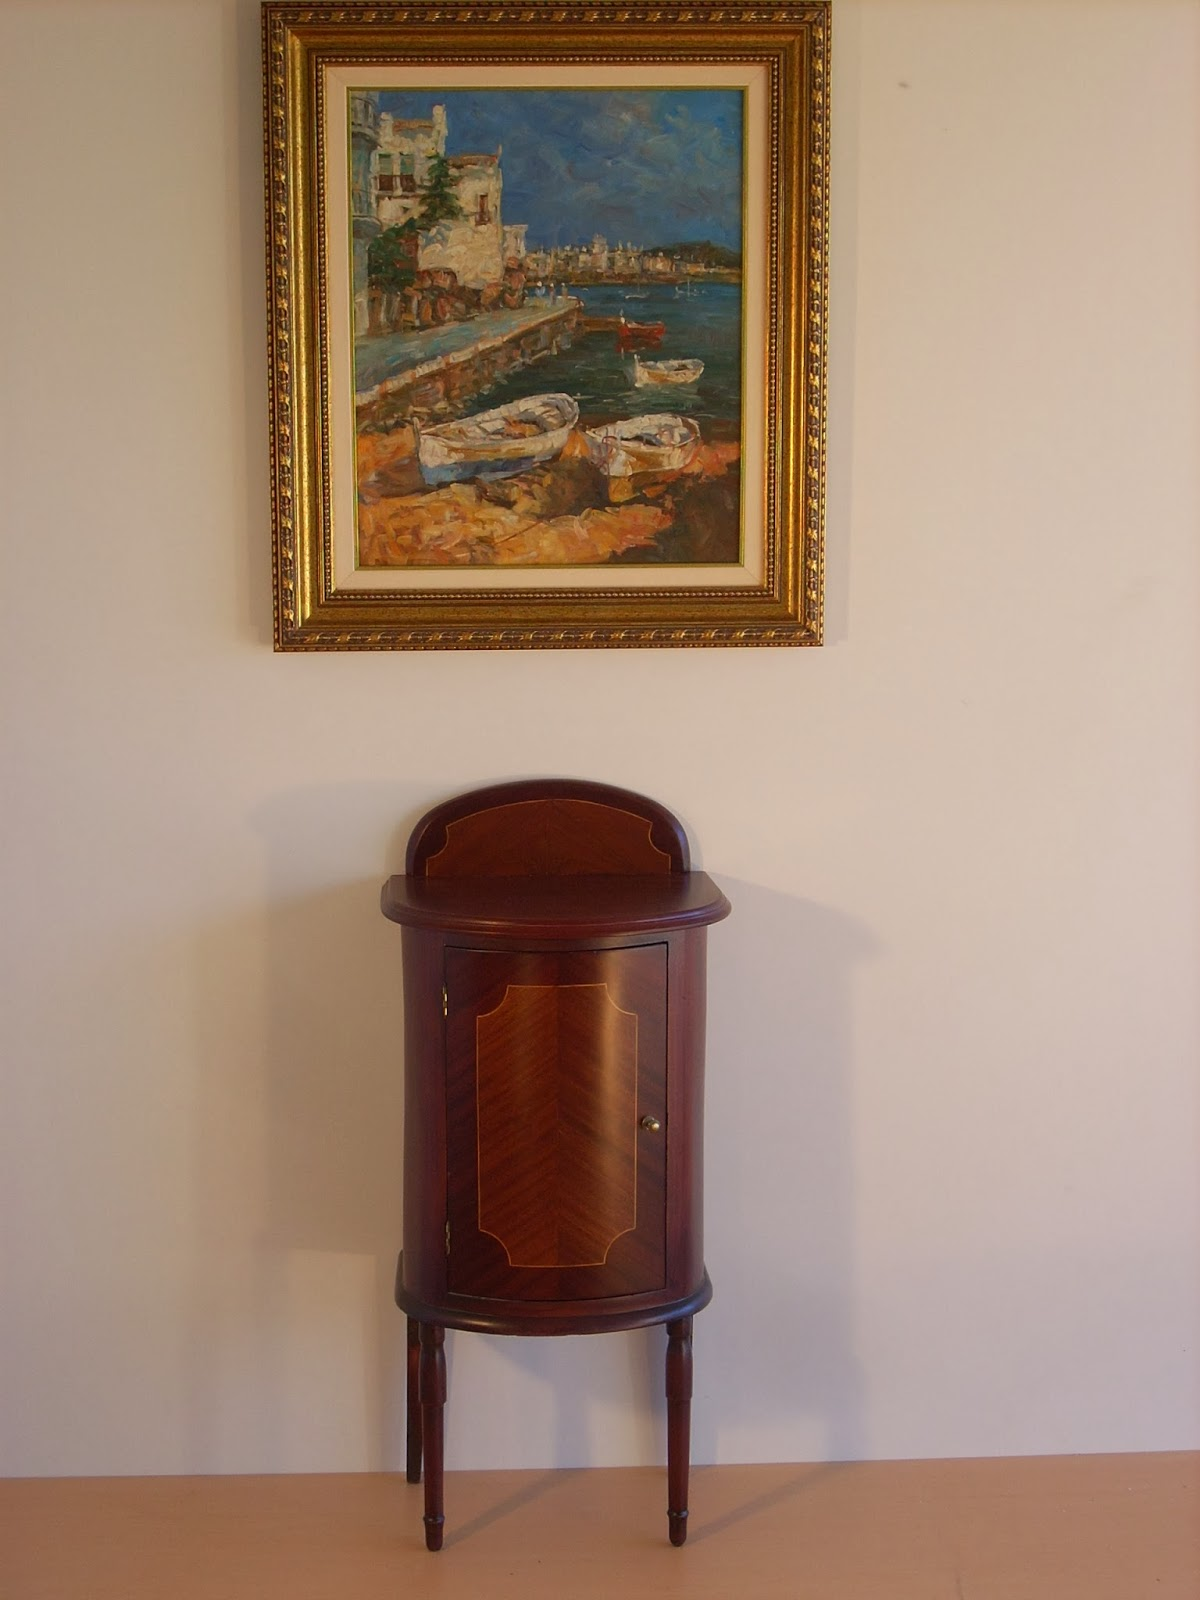 Venta de muebles antiguos restaurados naturmoble mesita - Comprar muebles antiguos ...